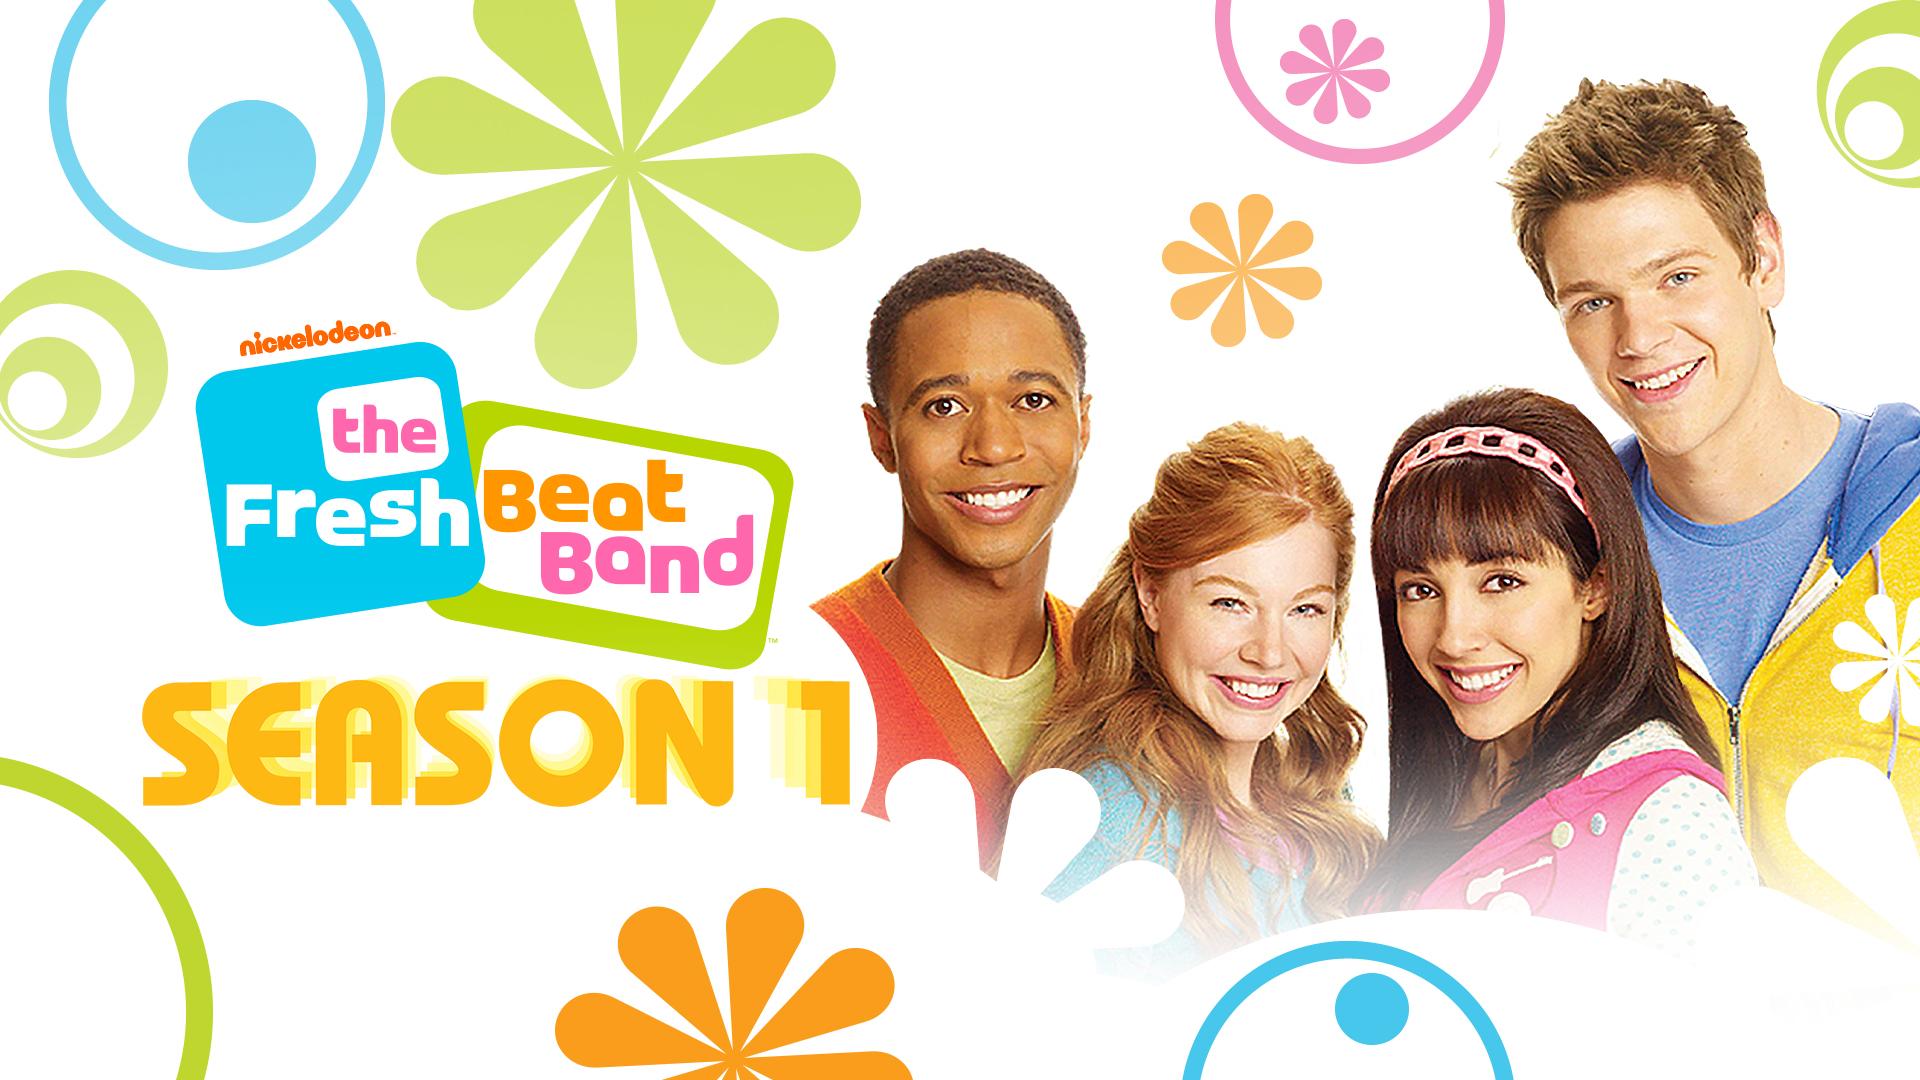 The Fresh Beat Band Season 1